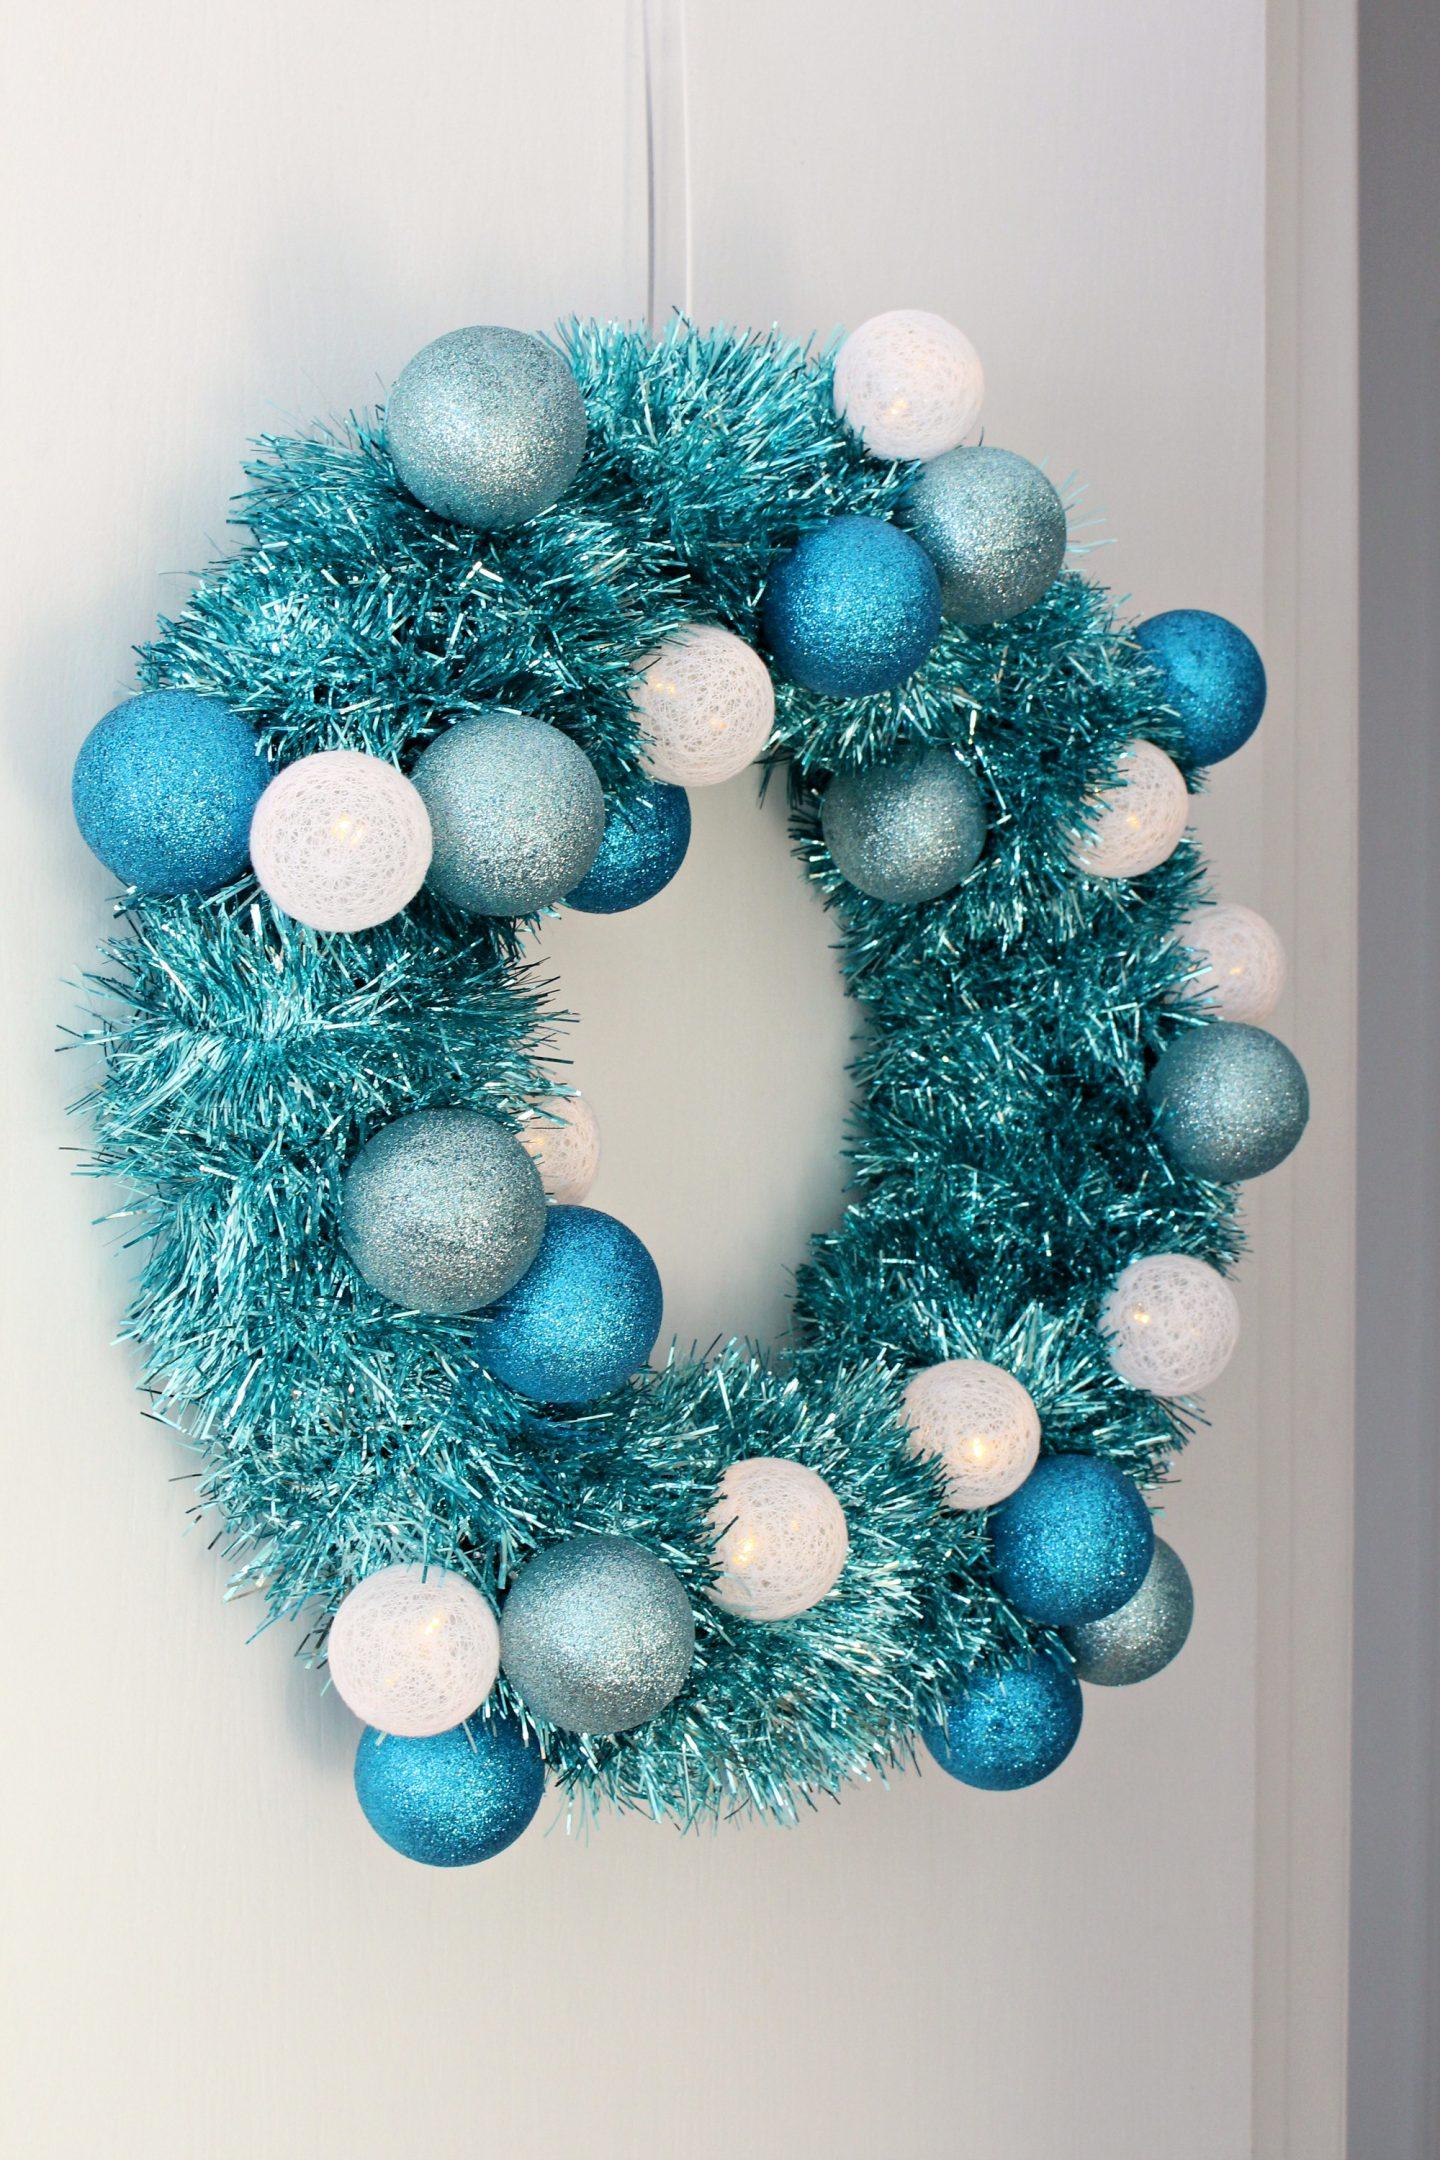 DIY Tinsel Wreath with Retro Vibes #diychristmas #tinsel #tinselwreath #retrochristmas Dollar Store Craft Ideas